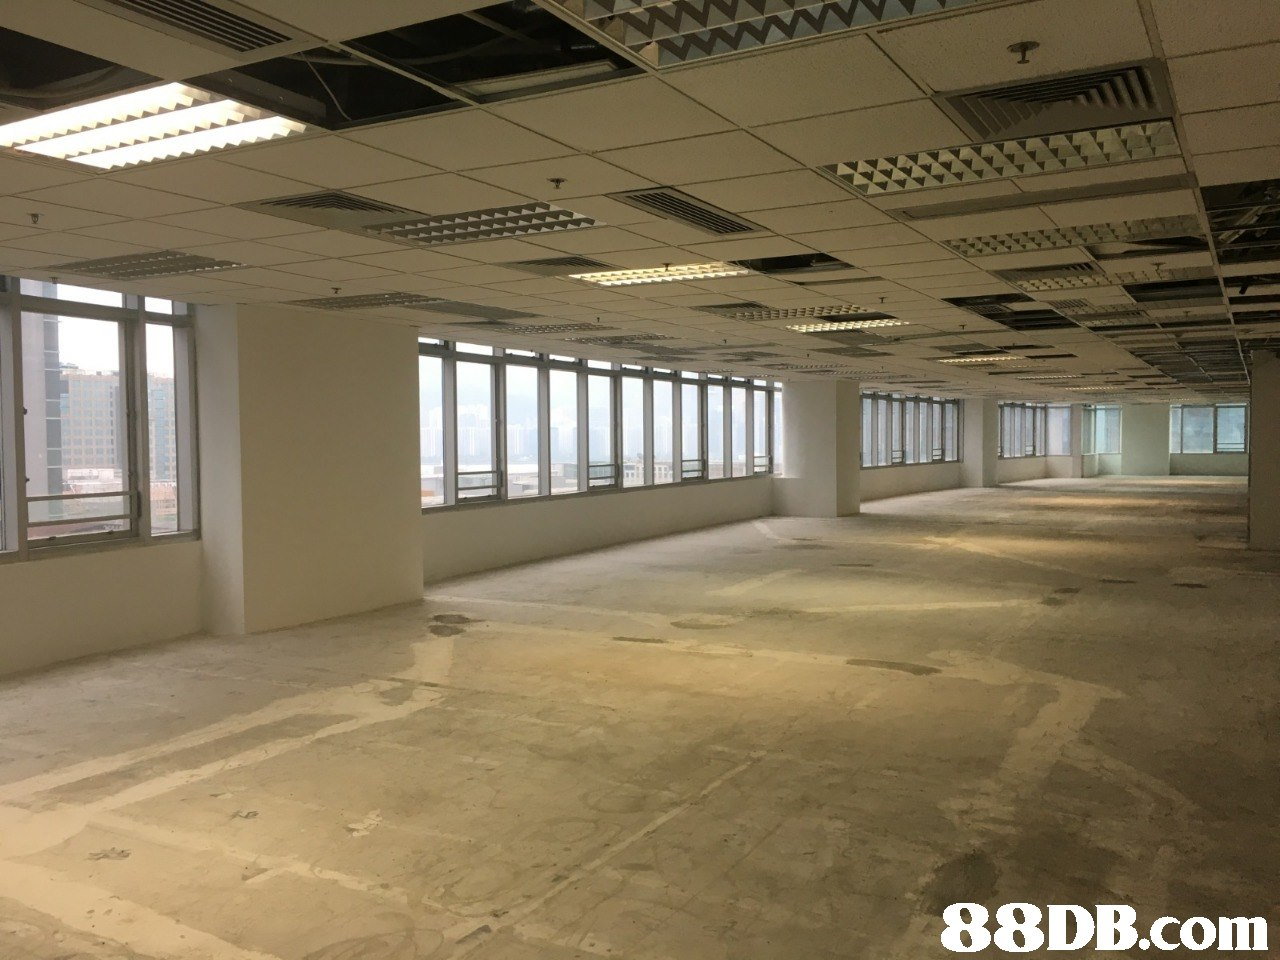 Property,Building,Ceiling,Floor,Room